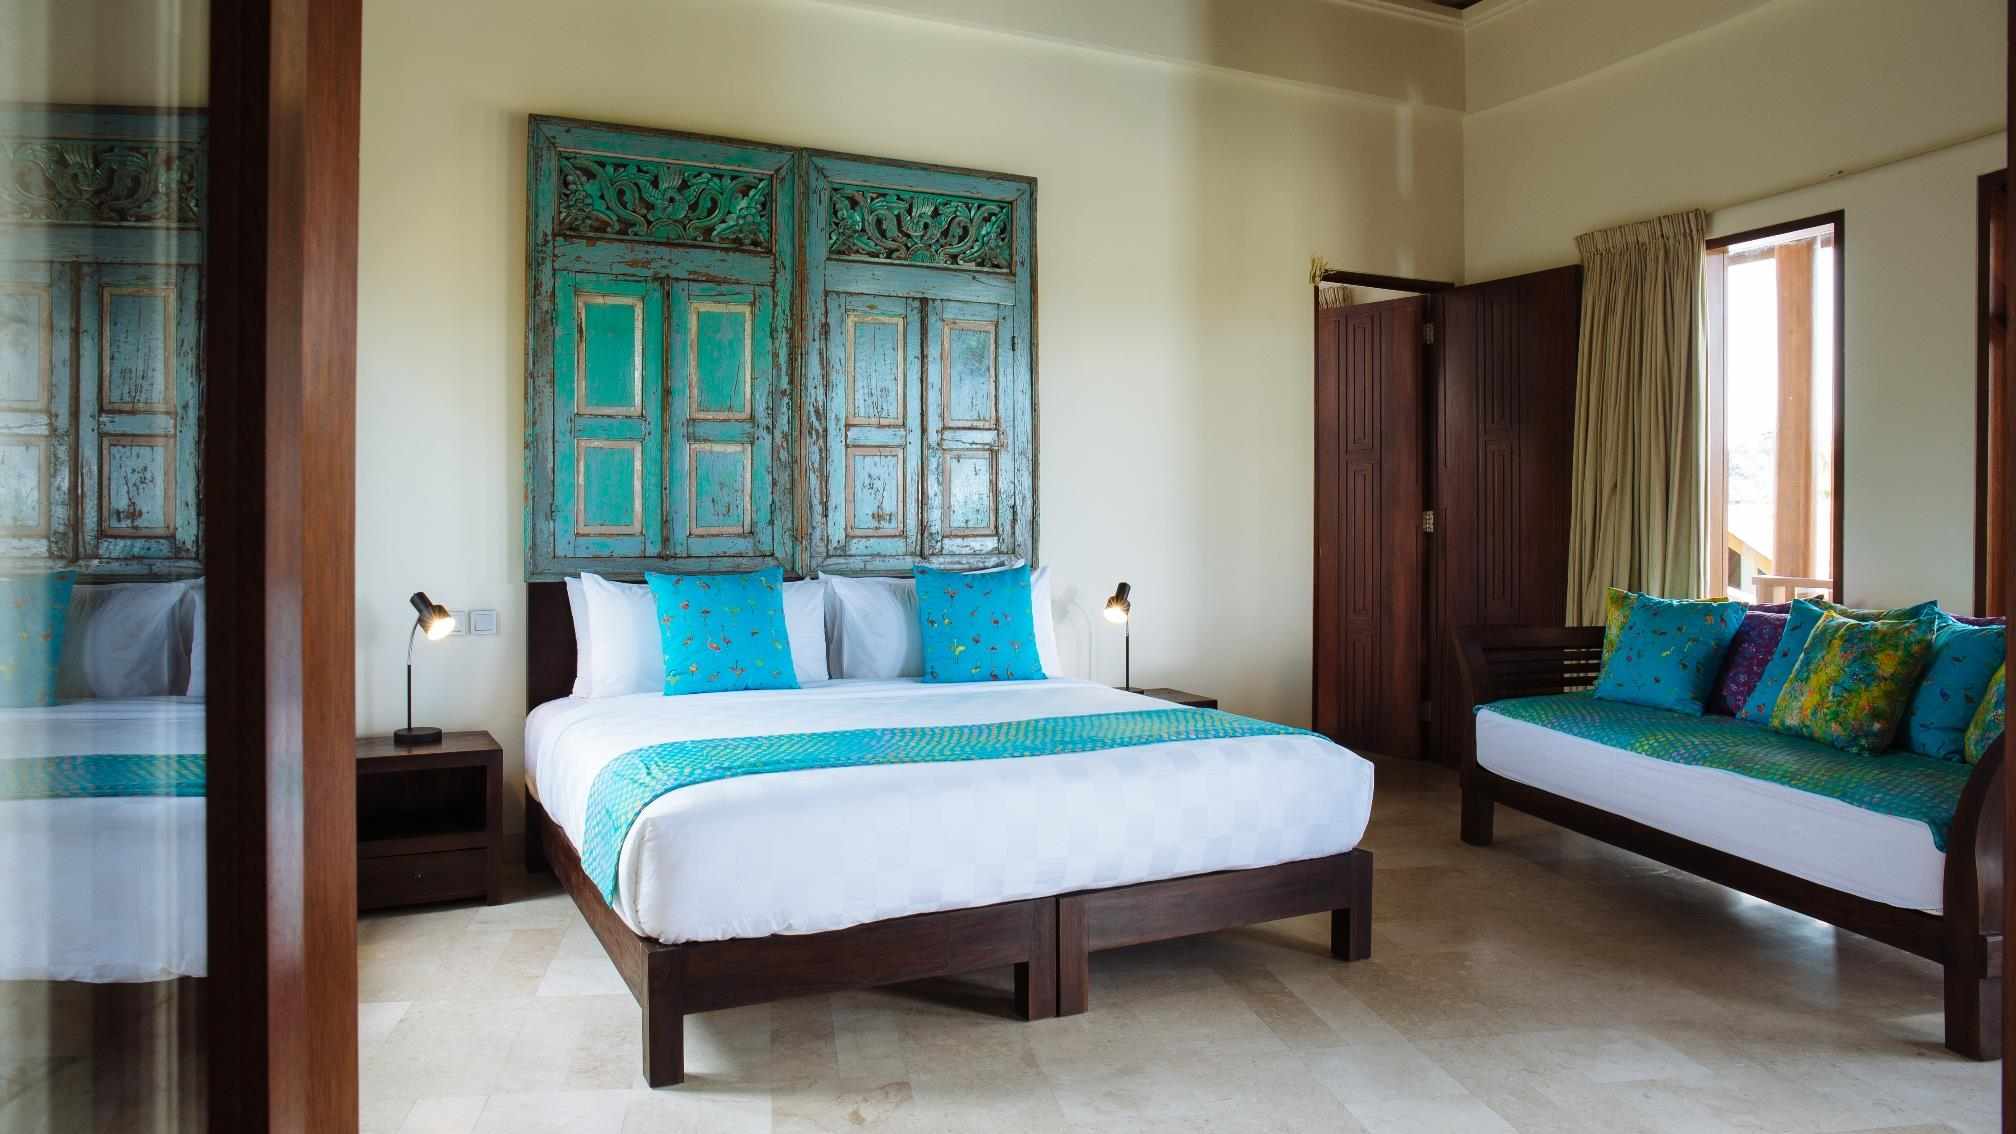 Bedroom with Table Lamps - Villa Umah Daun - Umalas, Bali